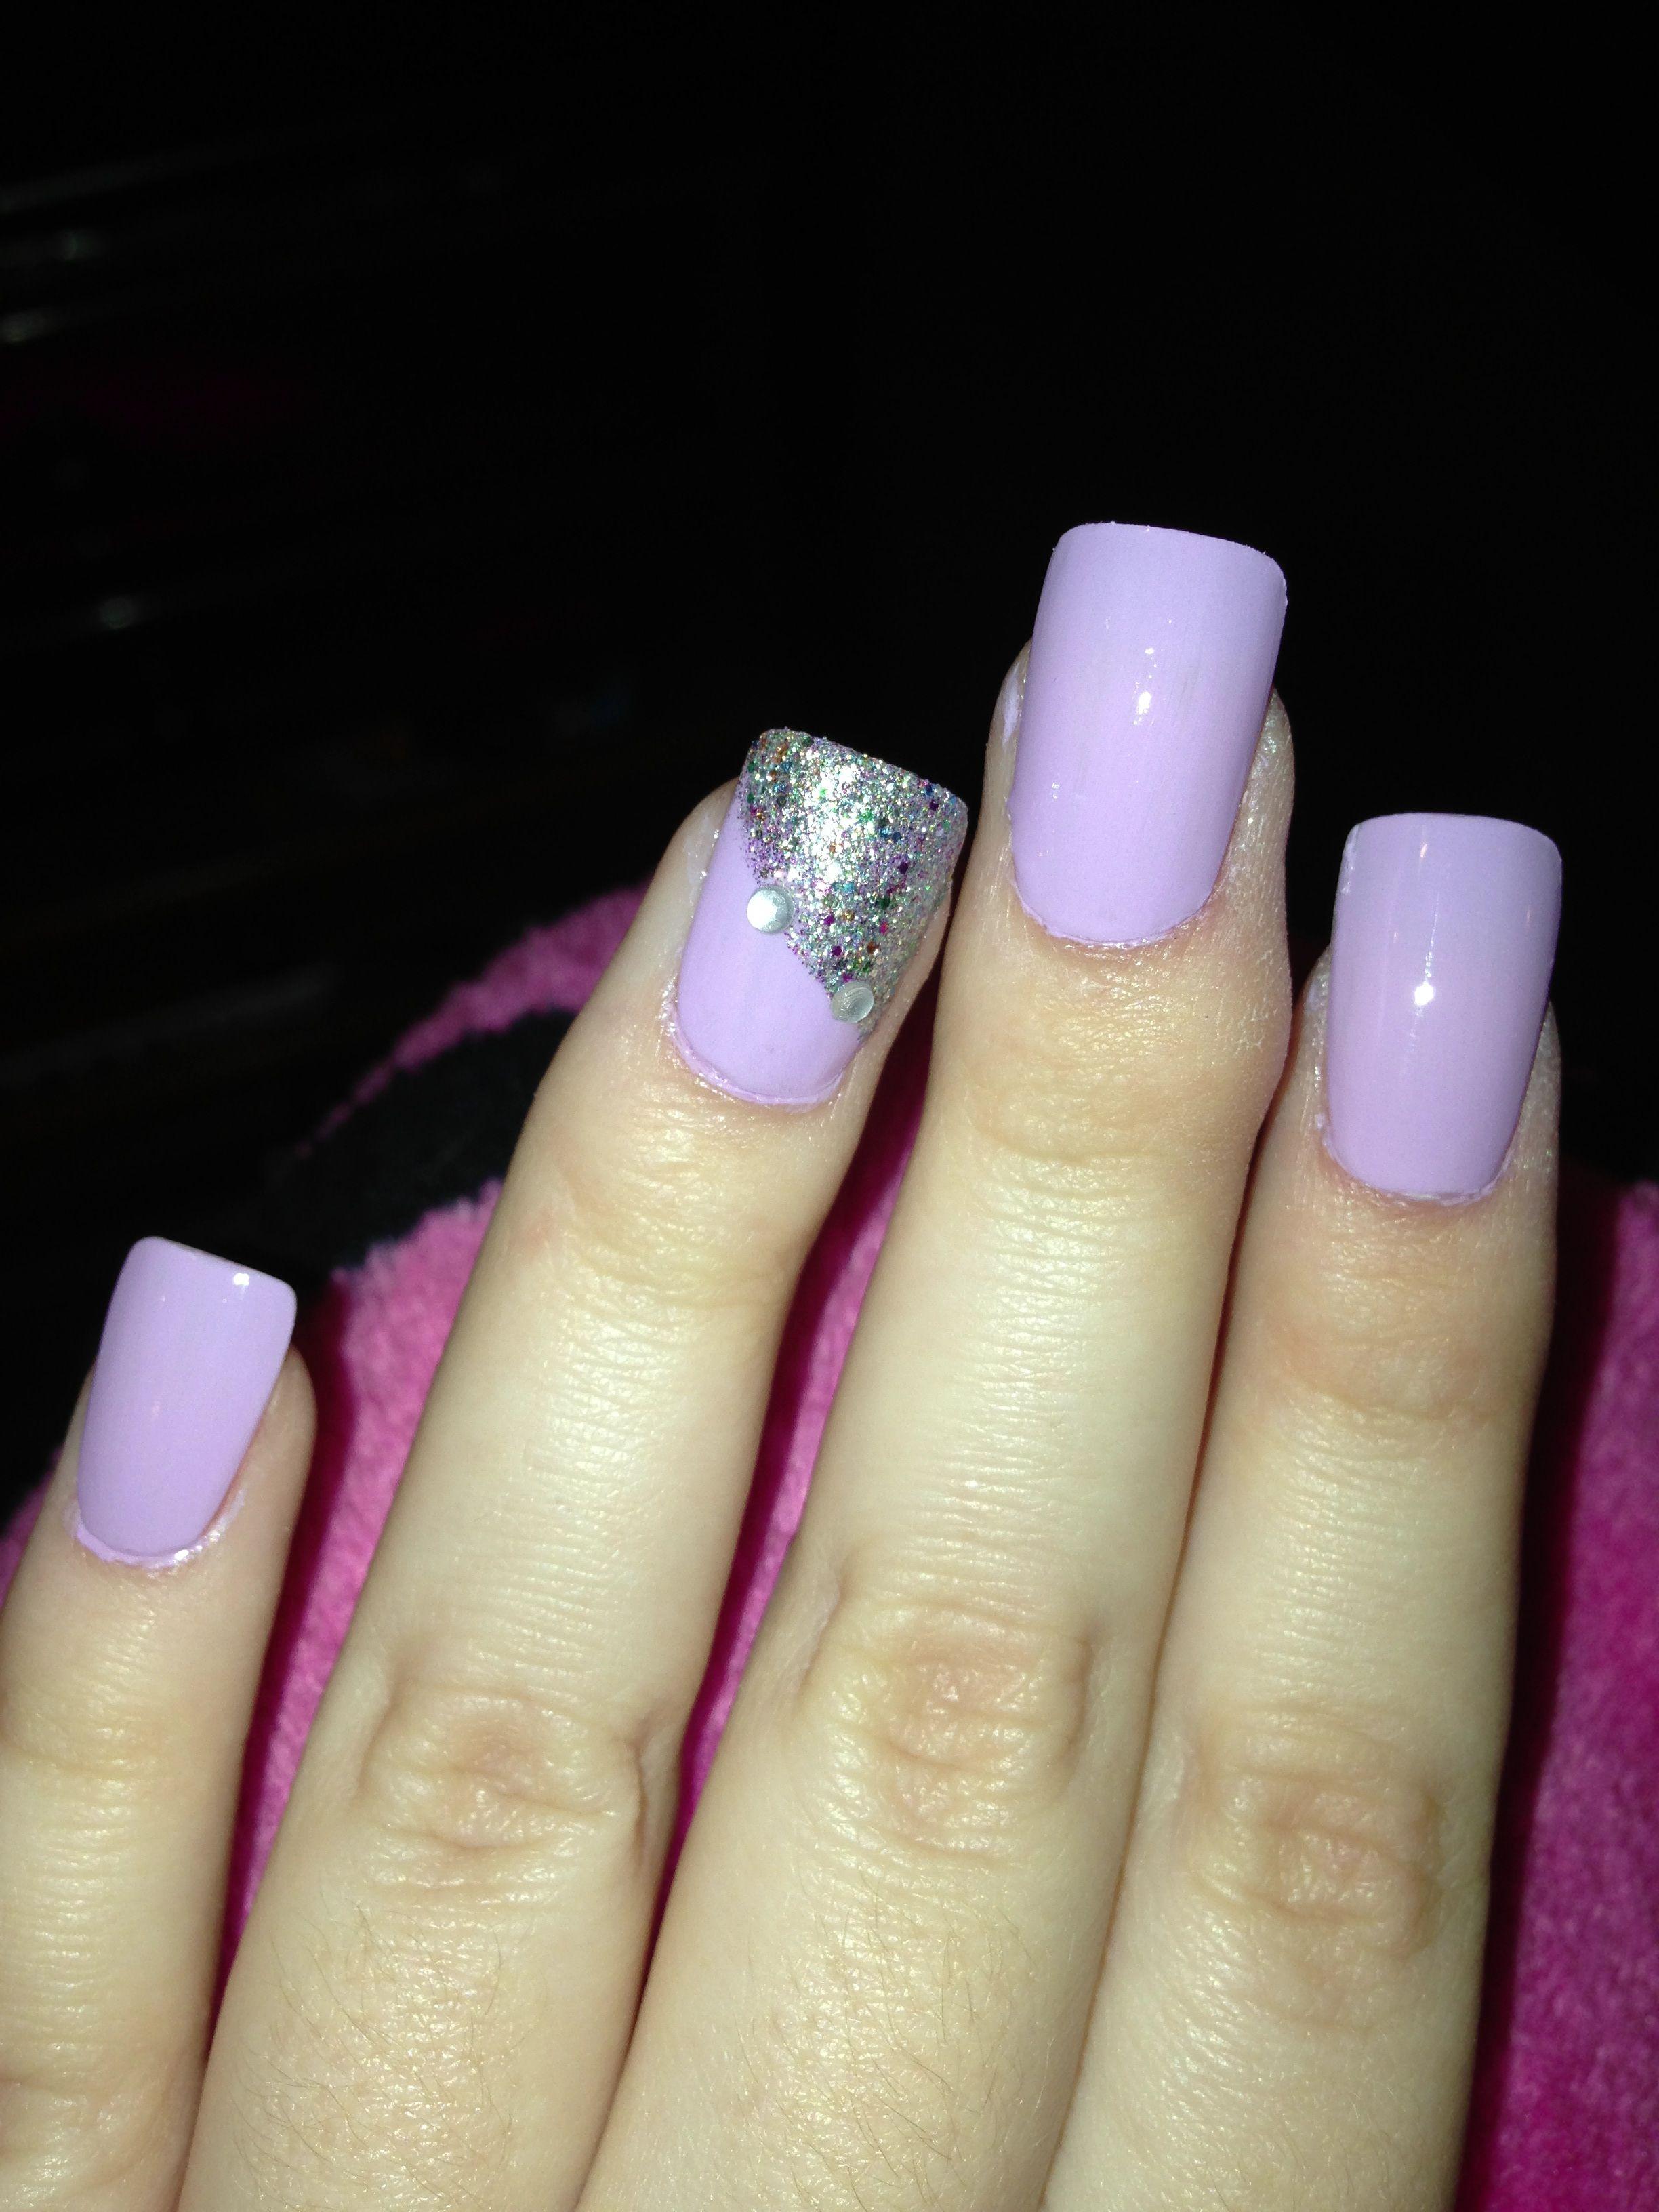 First time doing DIY fake nails | Nails | Pinterest | Makeup, School ...